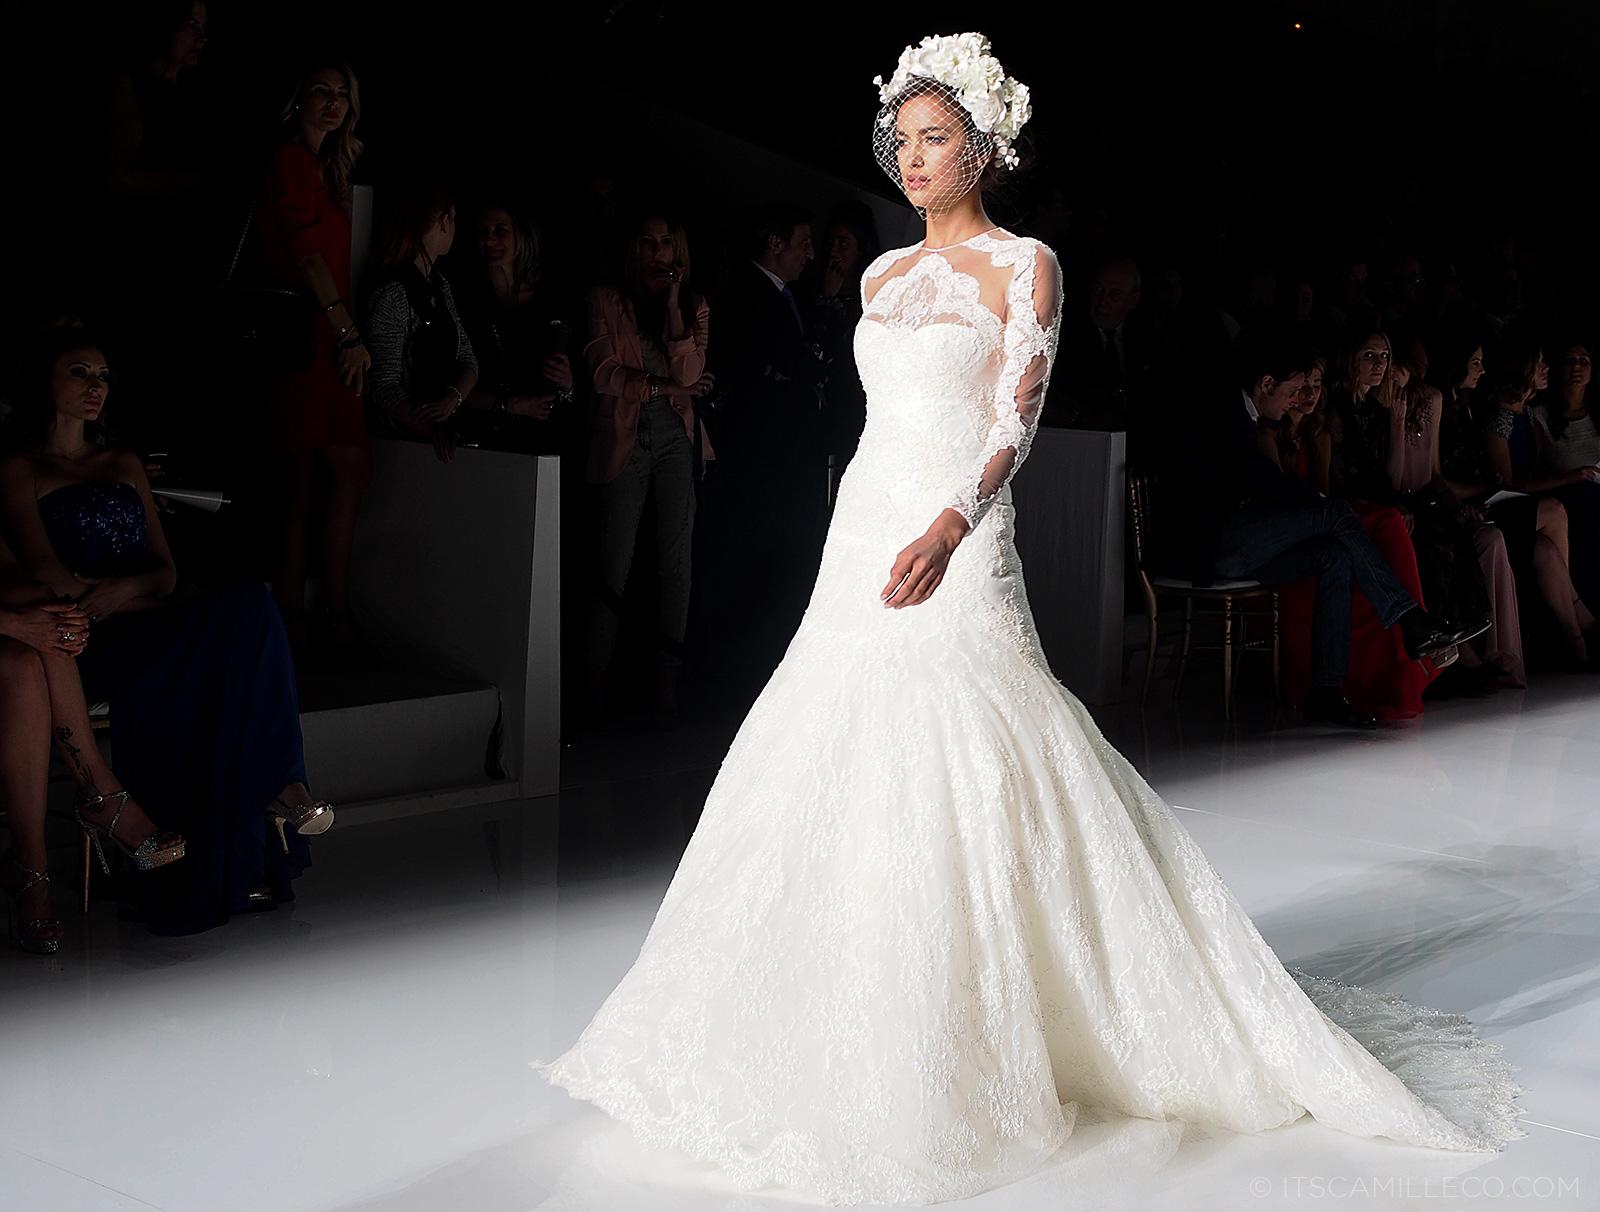 Angelic Wedding Dresses 92 Popular  itscamilleco